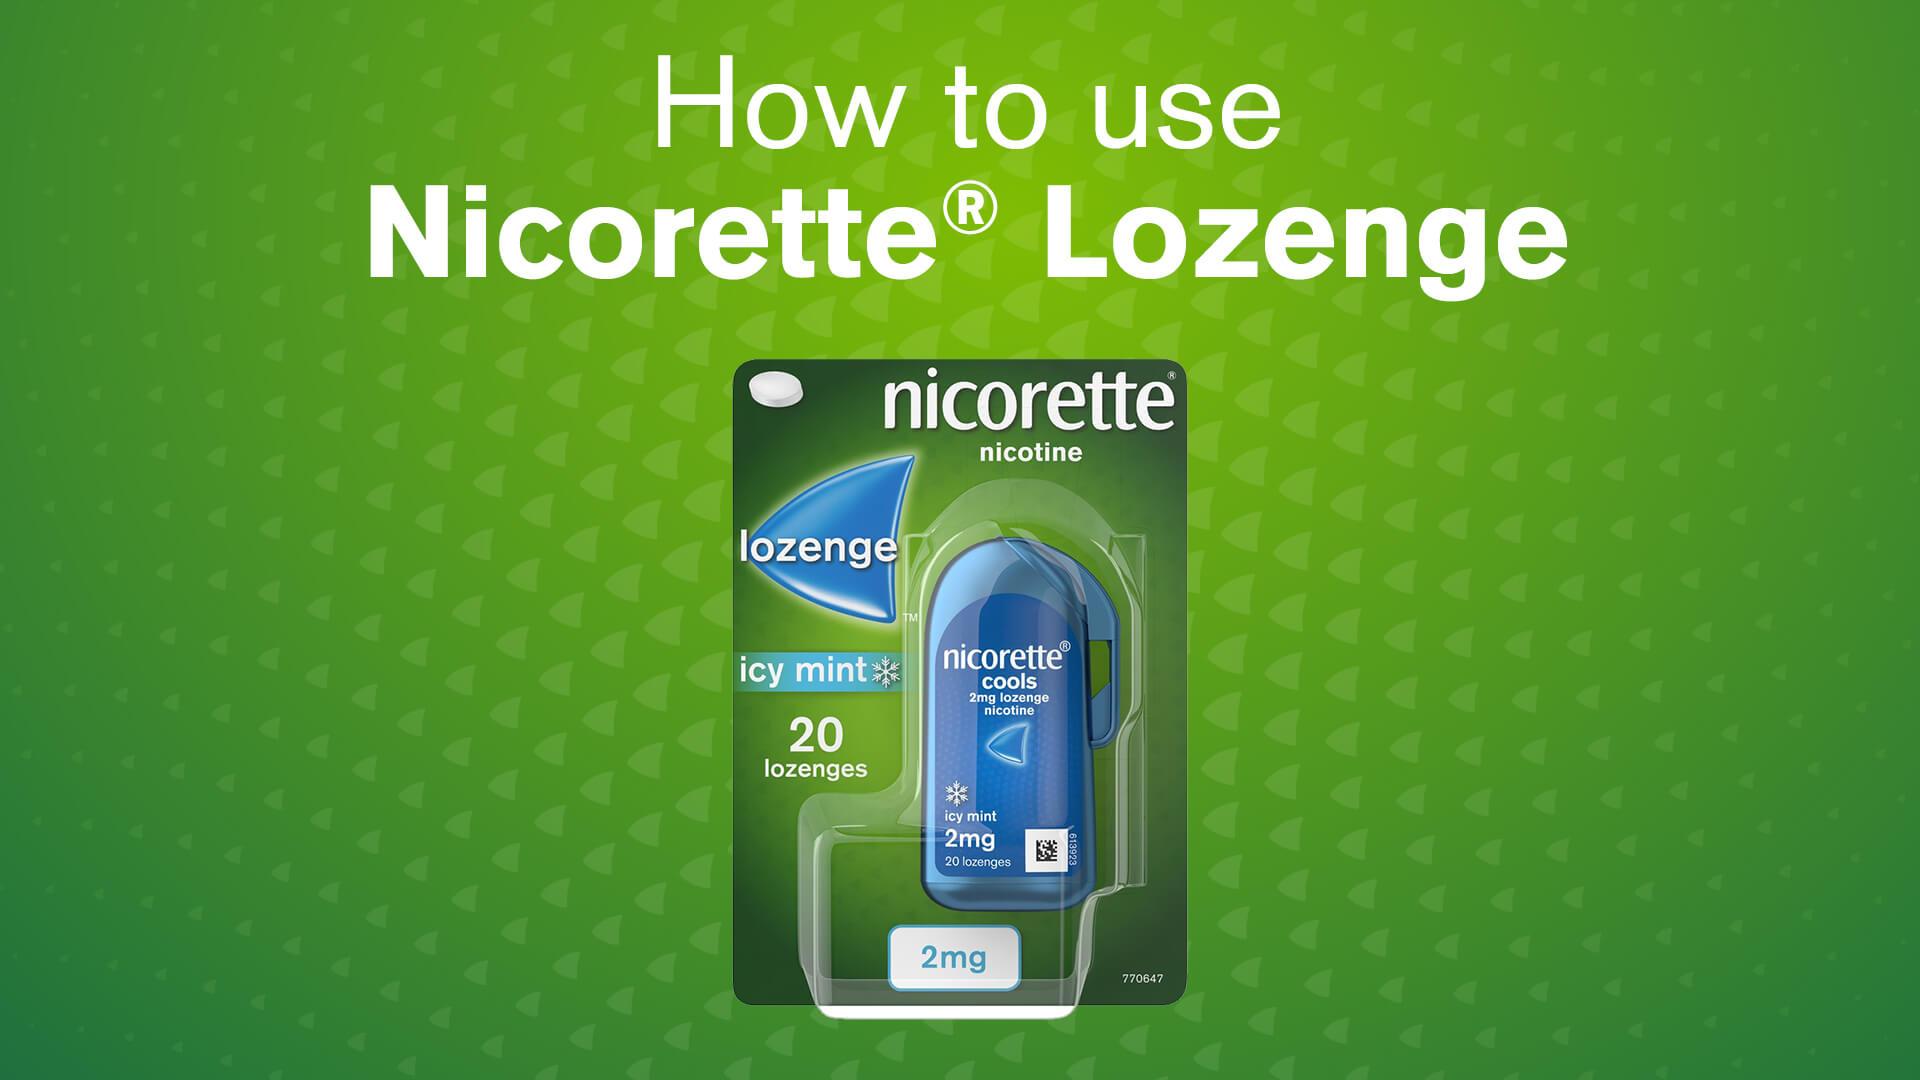 Nicorette® Lozenge